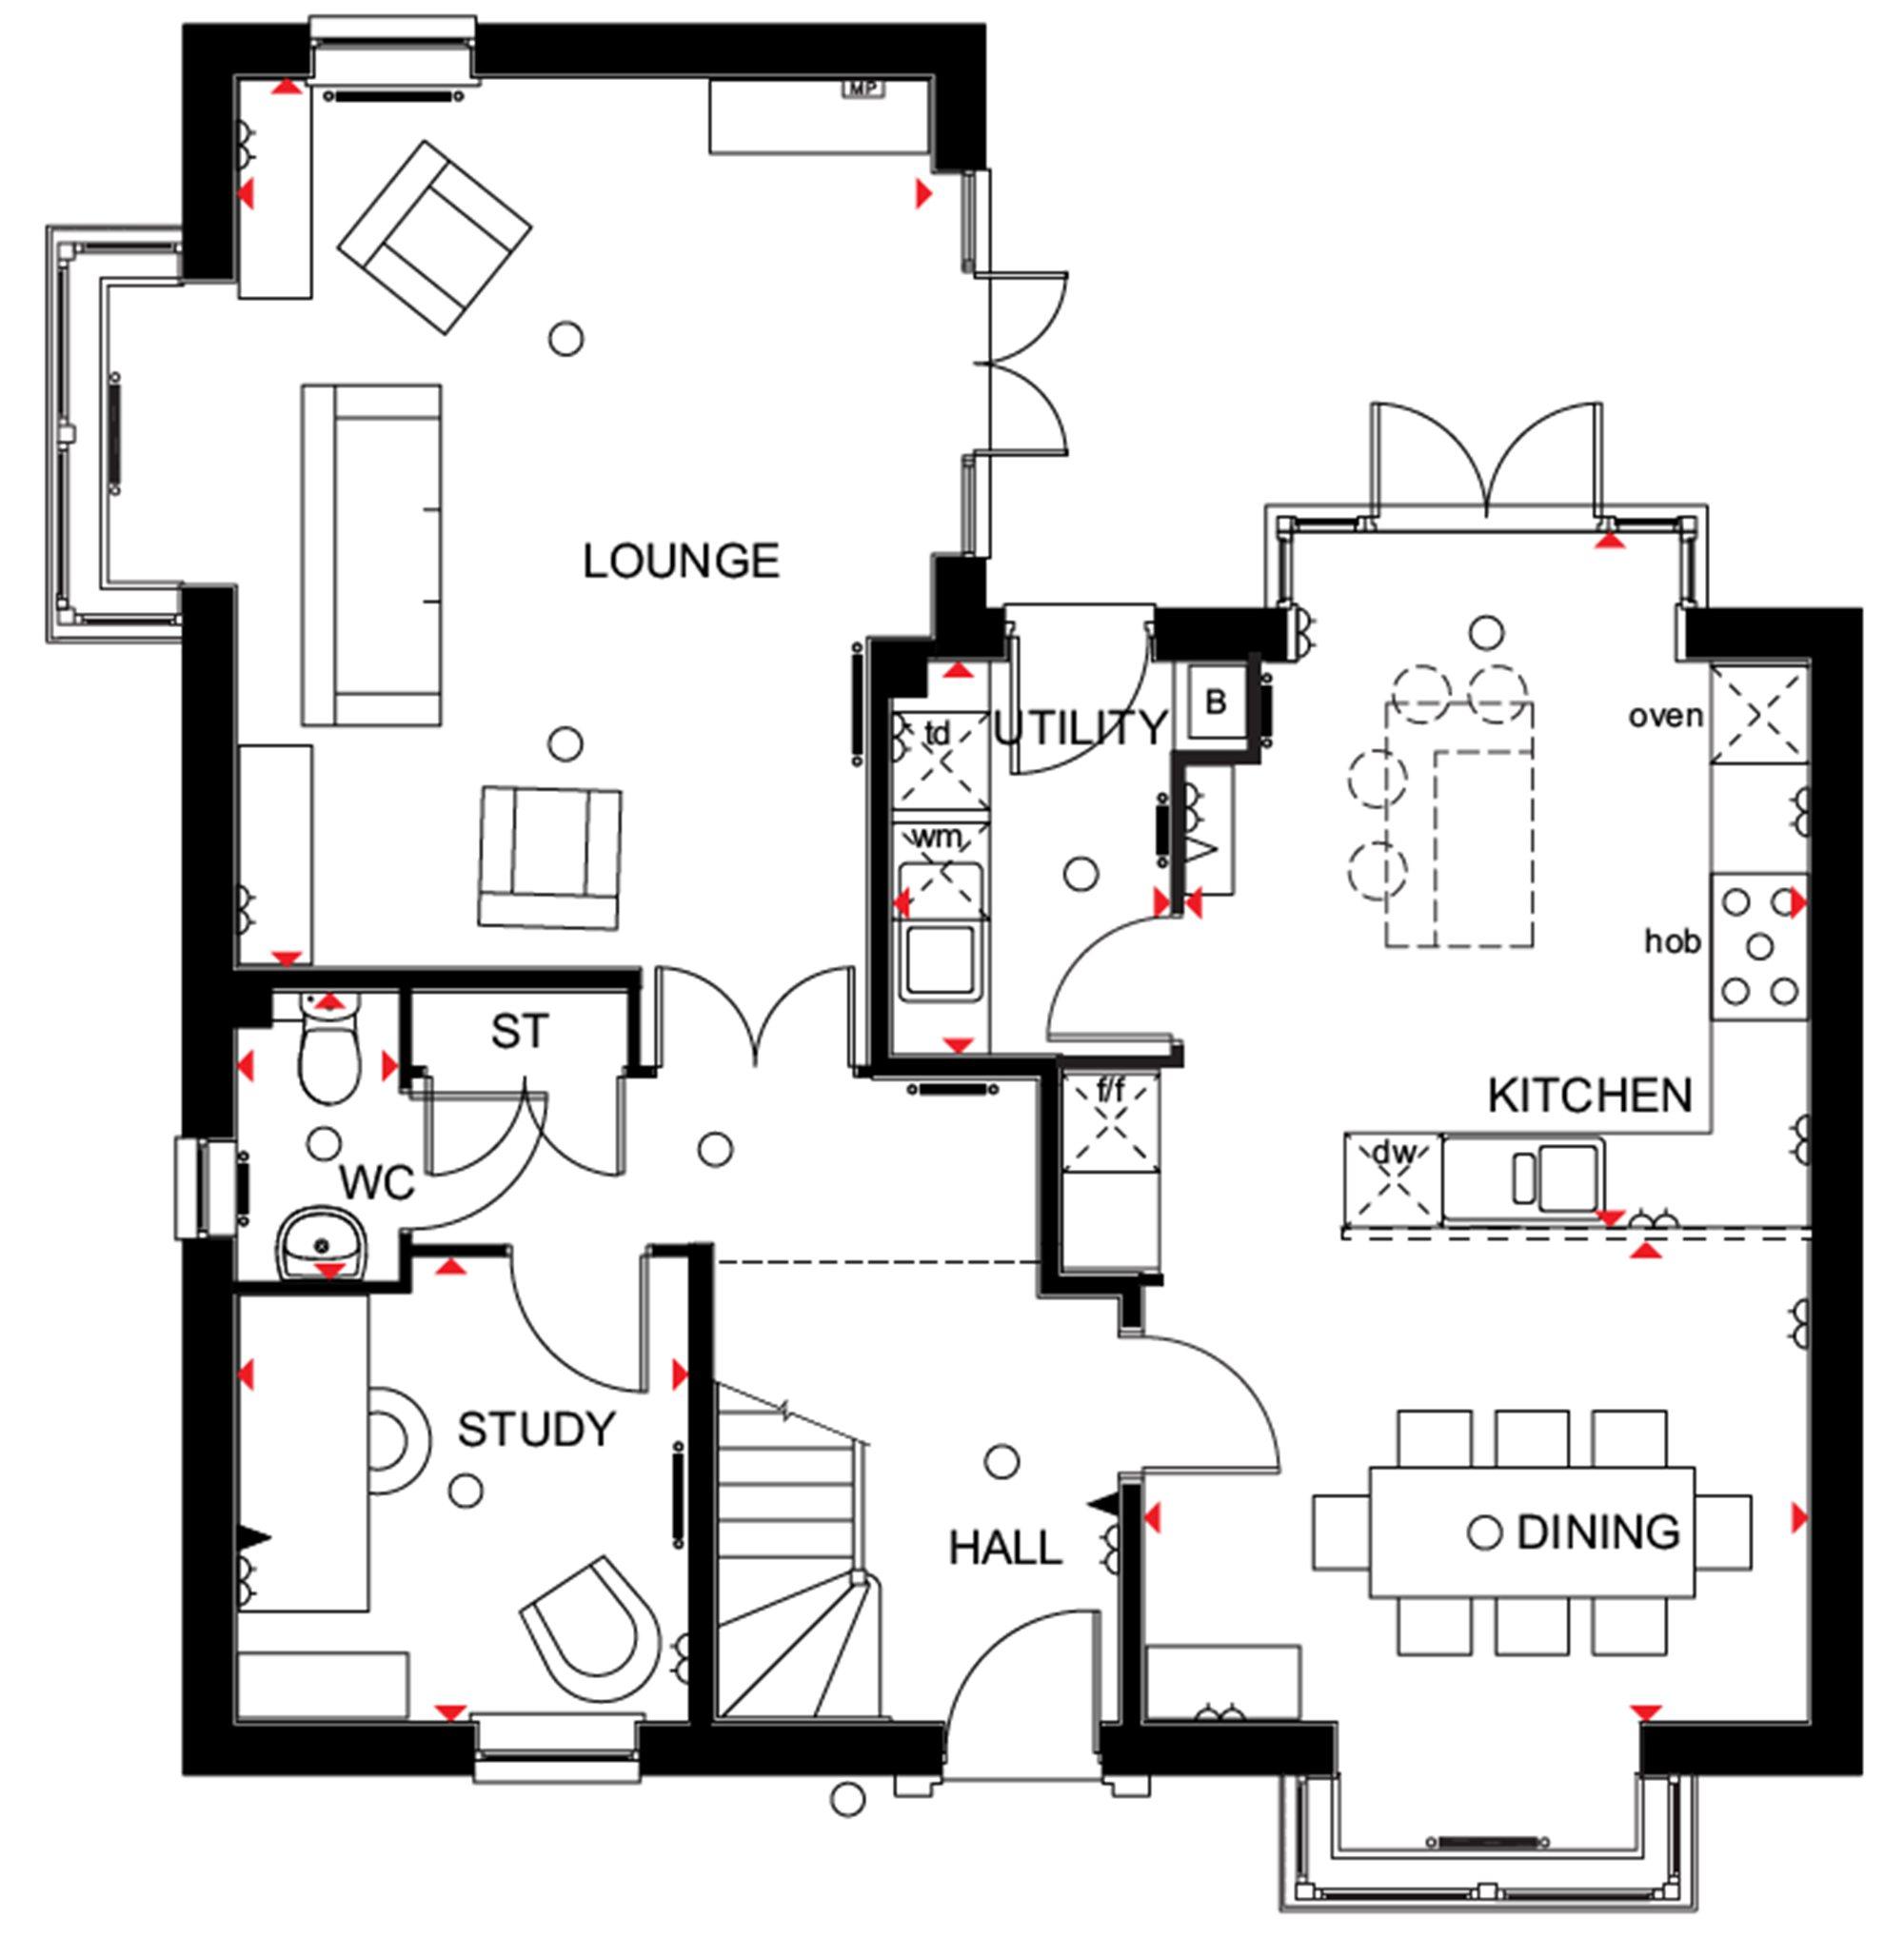 david wilson homes moorcroft floor plan 4 bedroom detached house for sale in meynell road quorn